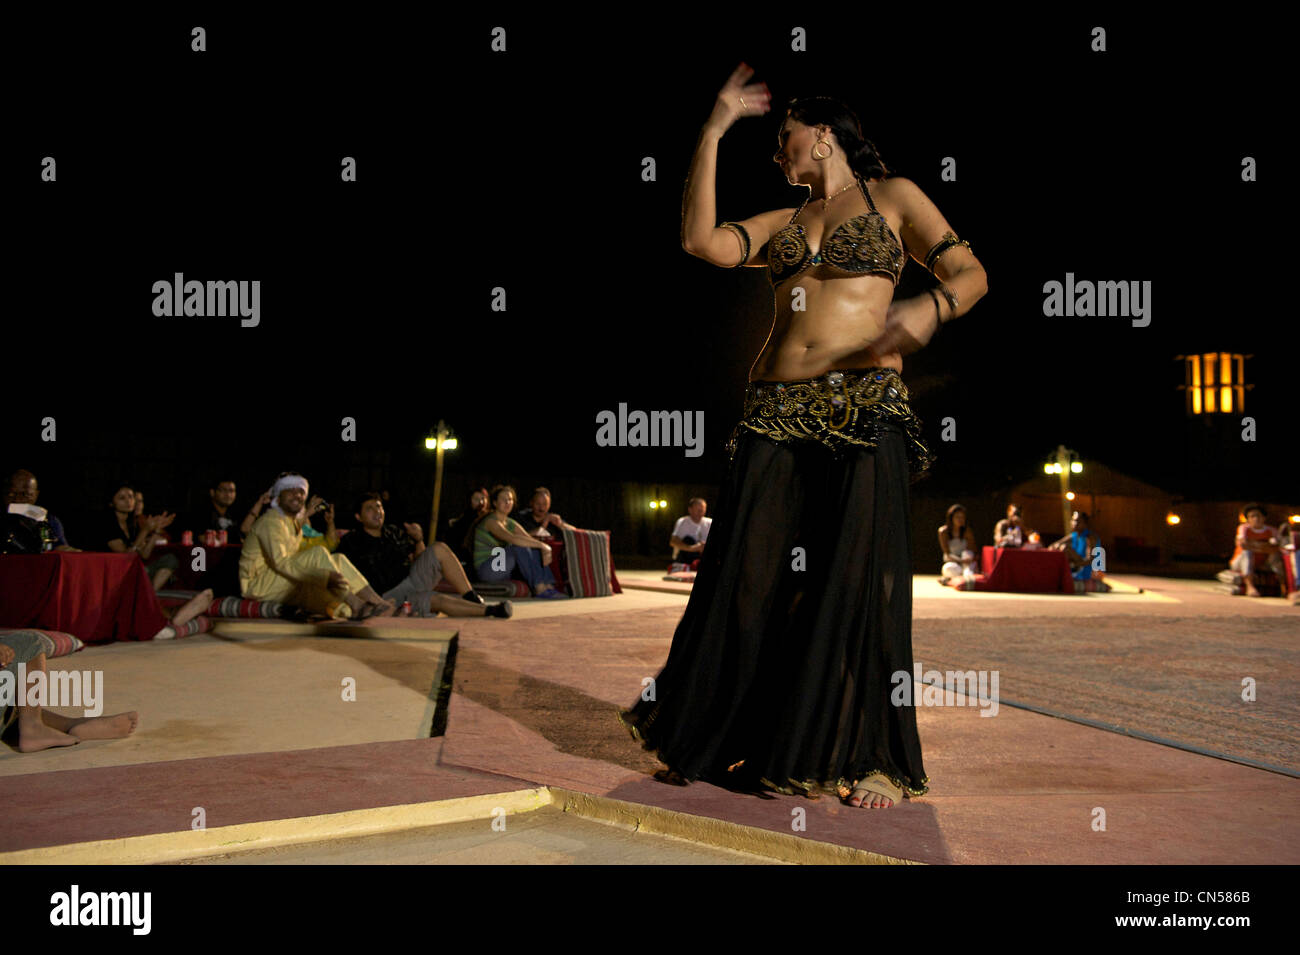 United Arab Emirates, Dubai, dance spectacle in the desert - Stock Image